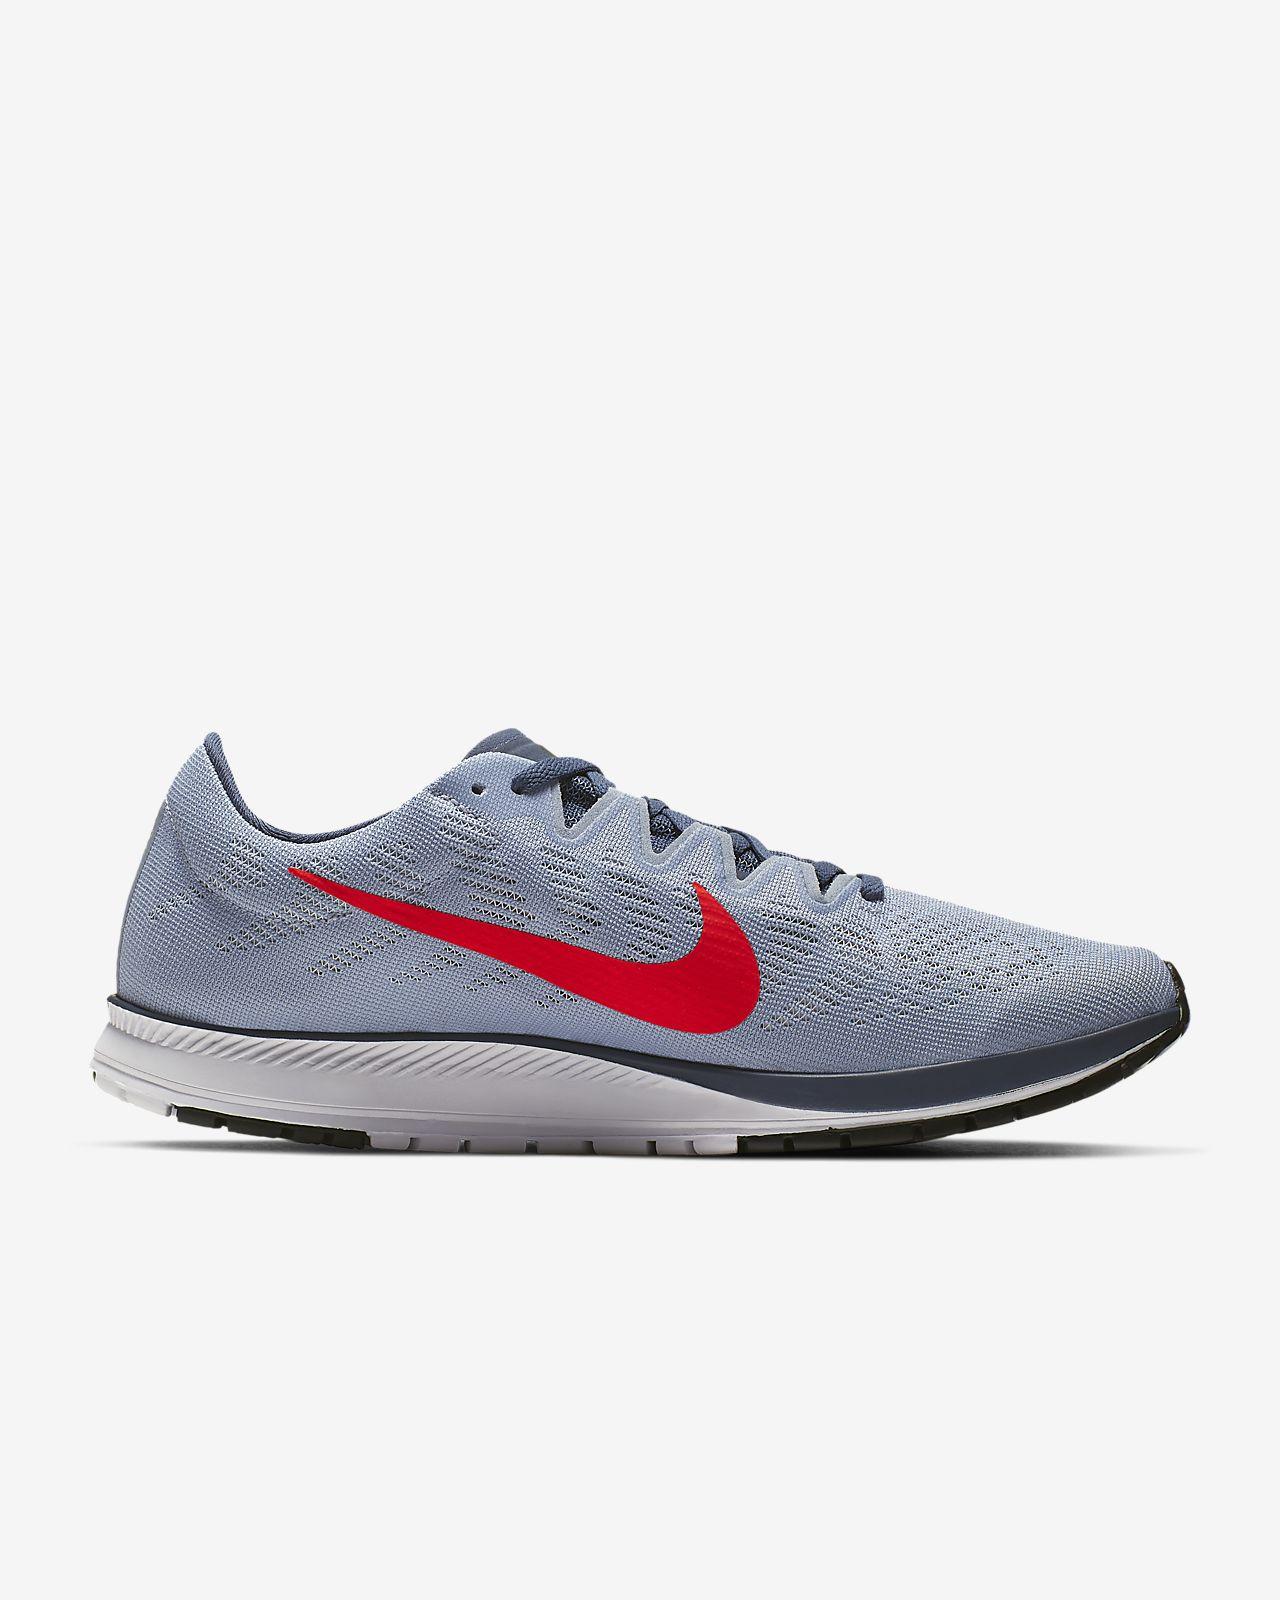 325e2e9037d Nike Air Zoom Streak 7 Running Shoe. Nike.com IE